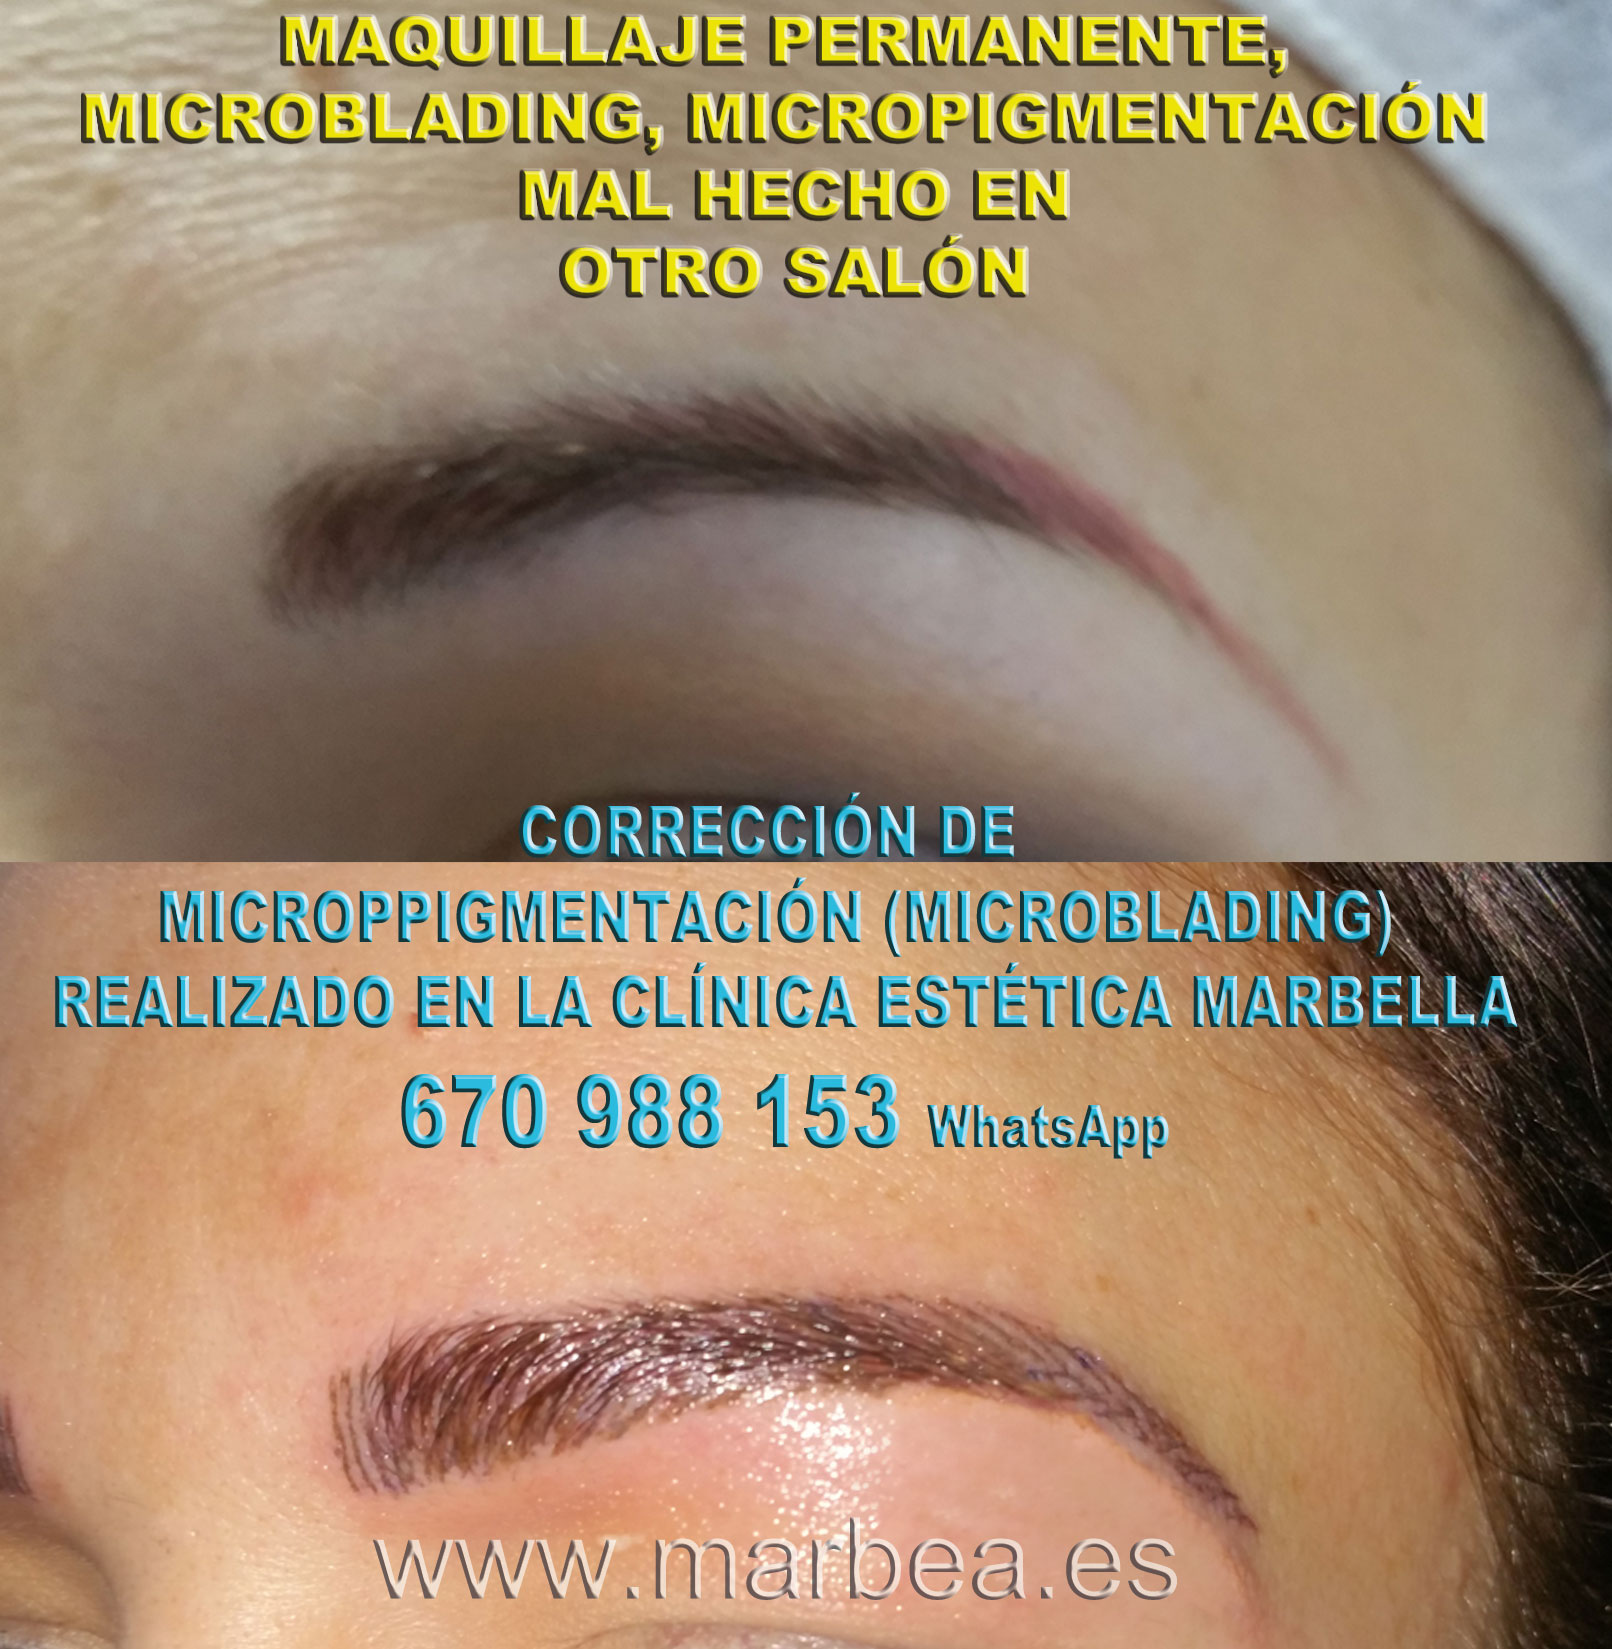 ELIMINAR TATUAJE CEJAS clínica estética maquillaje semipermanente propone eliminar la micropigmentación de cejas,corregir micropigmentación no deseada